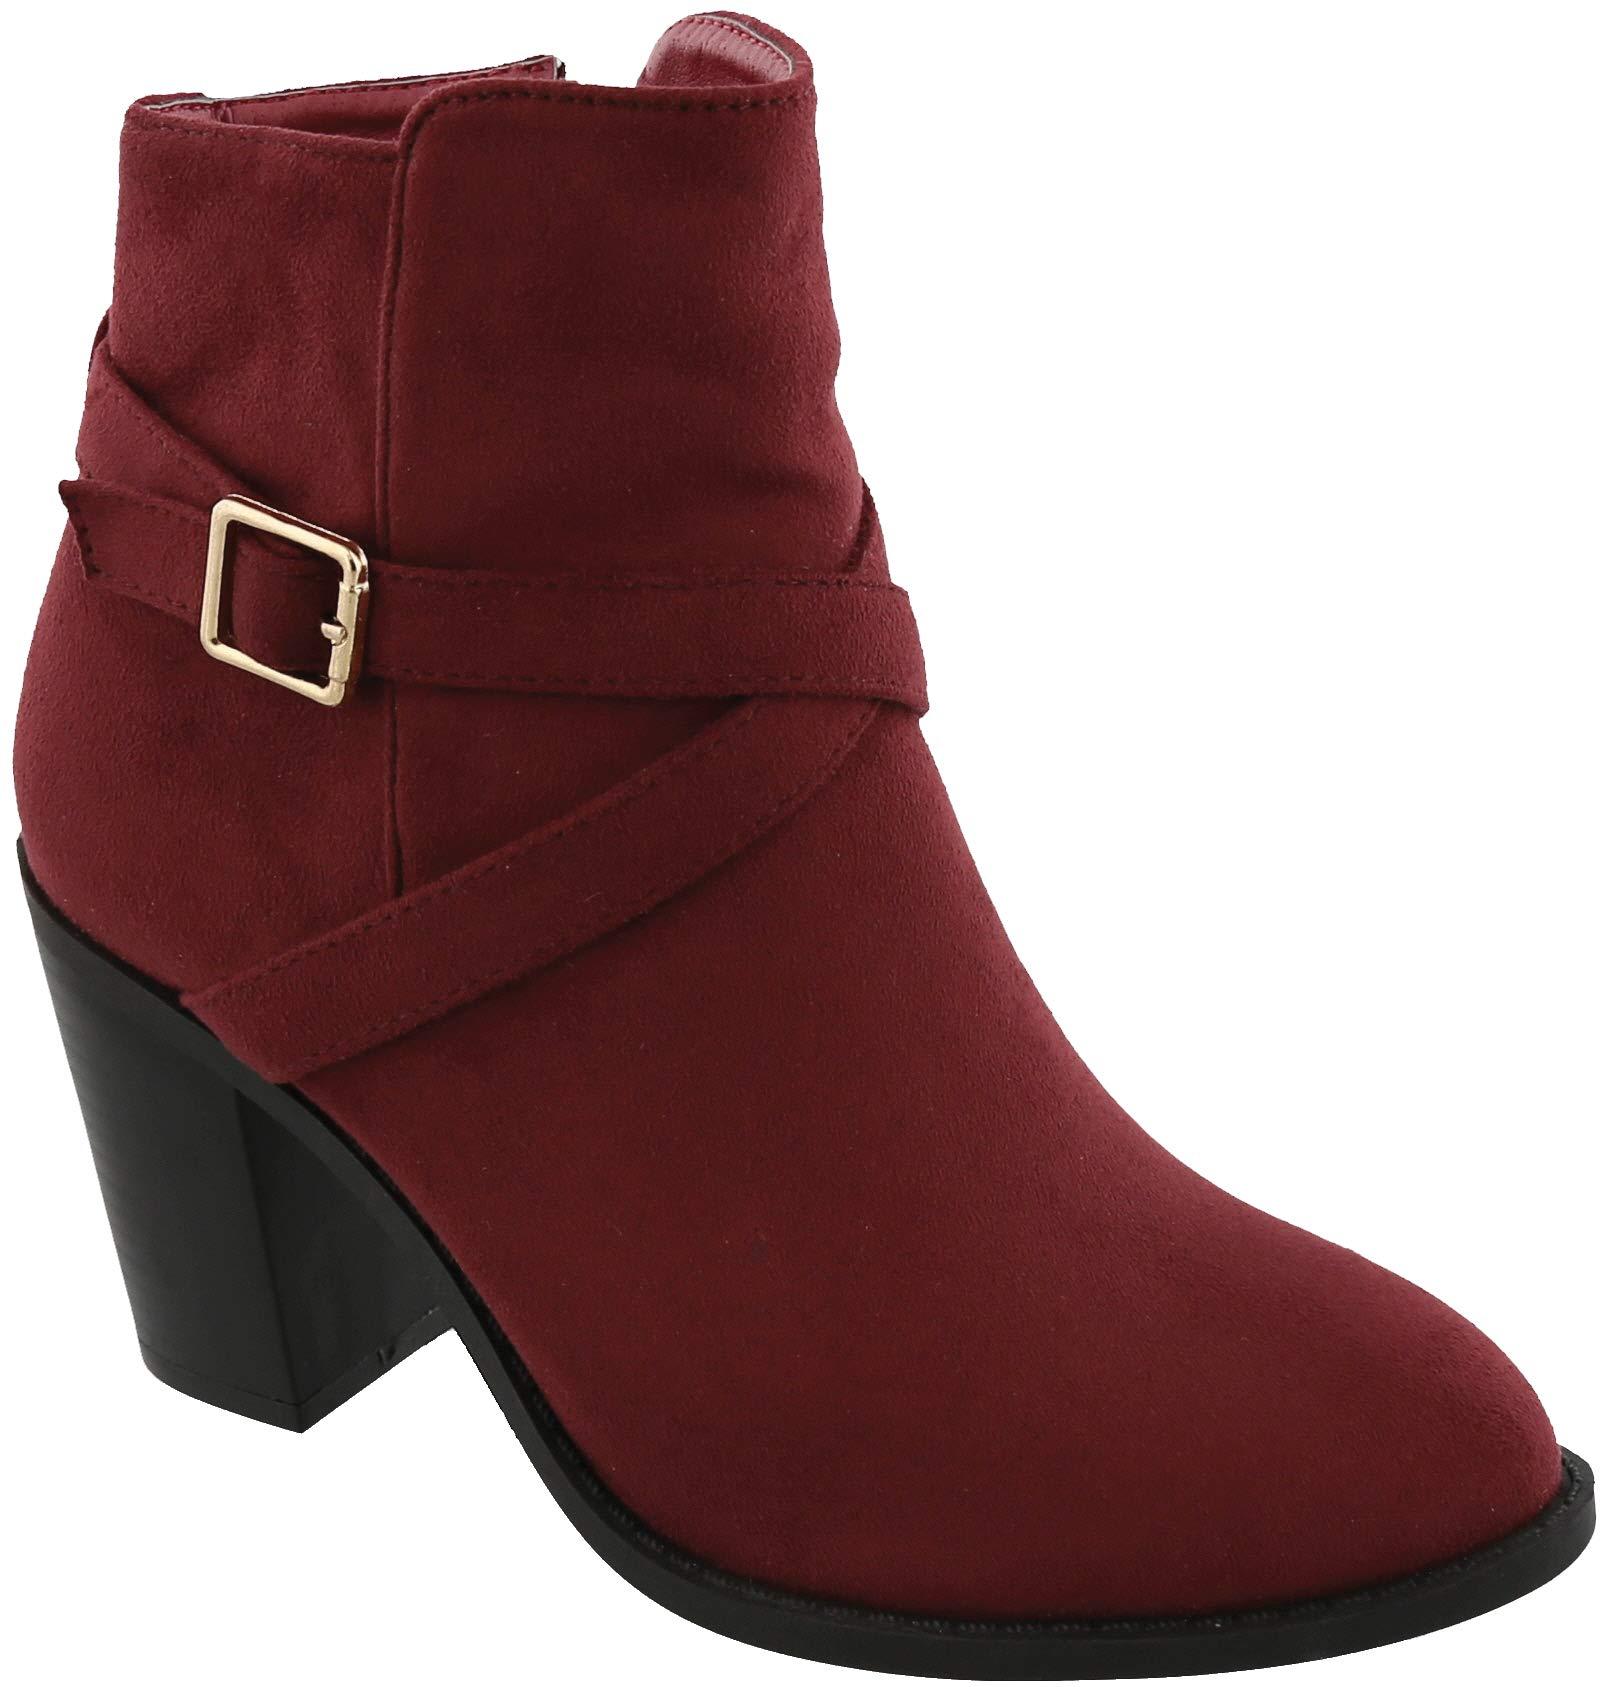 MVE Shoes Womens Crisscross Buckle Side Zip High Stacked Block Heel Ankle Booties,